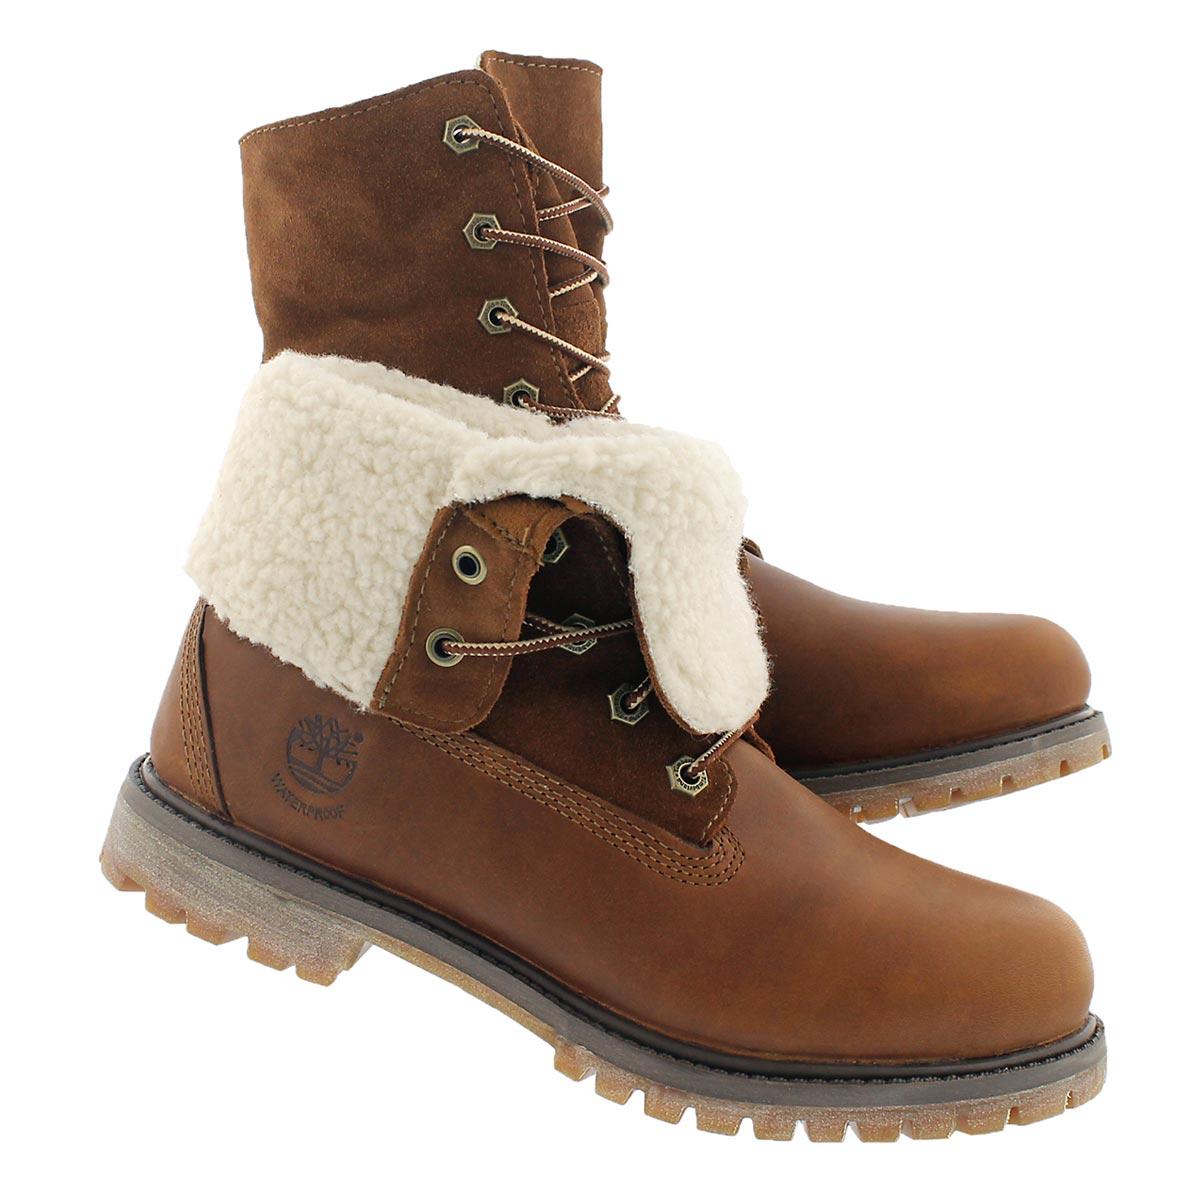 Lds Authentics Teddy tbac fold down boot